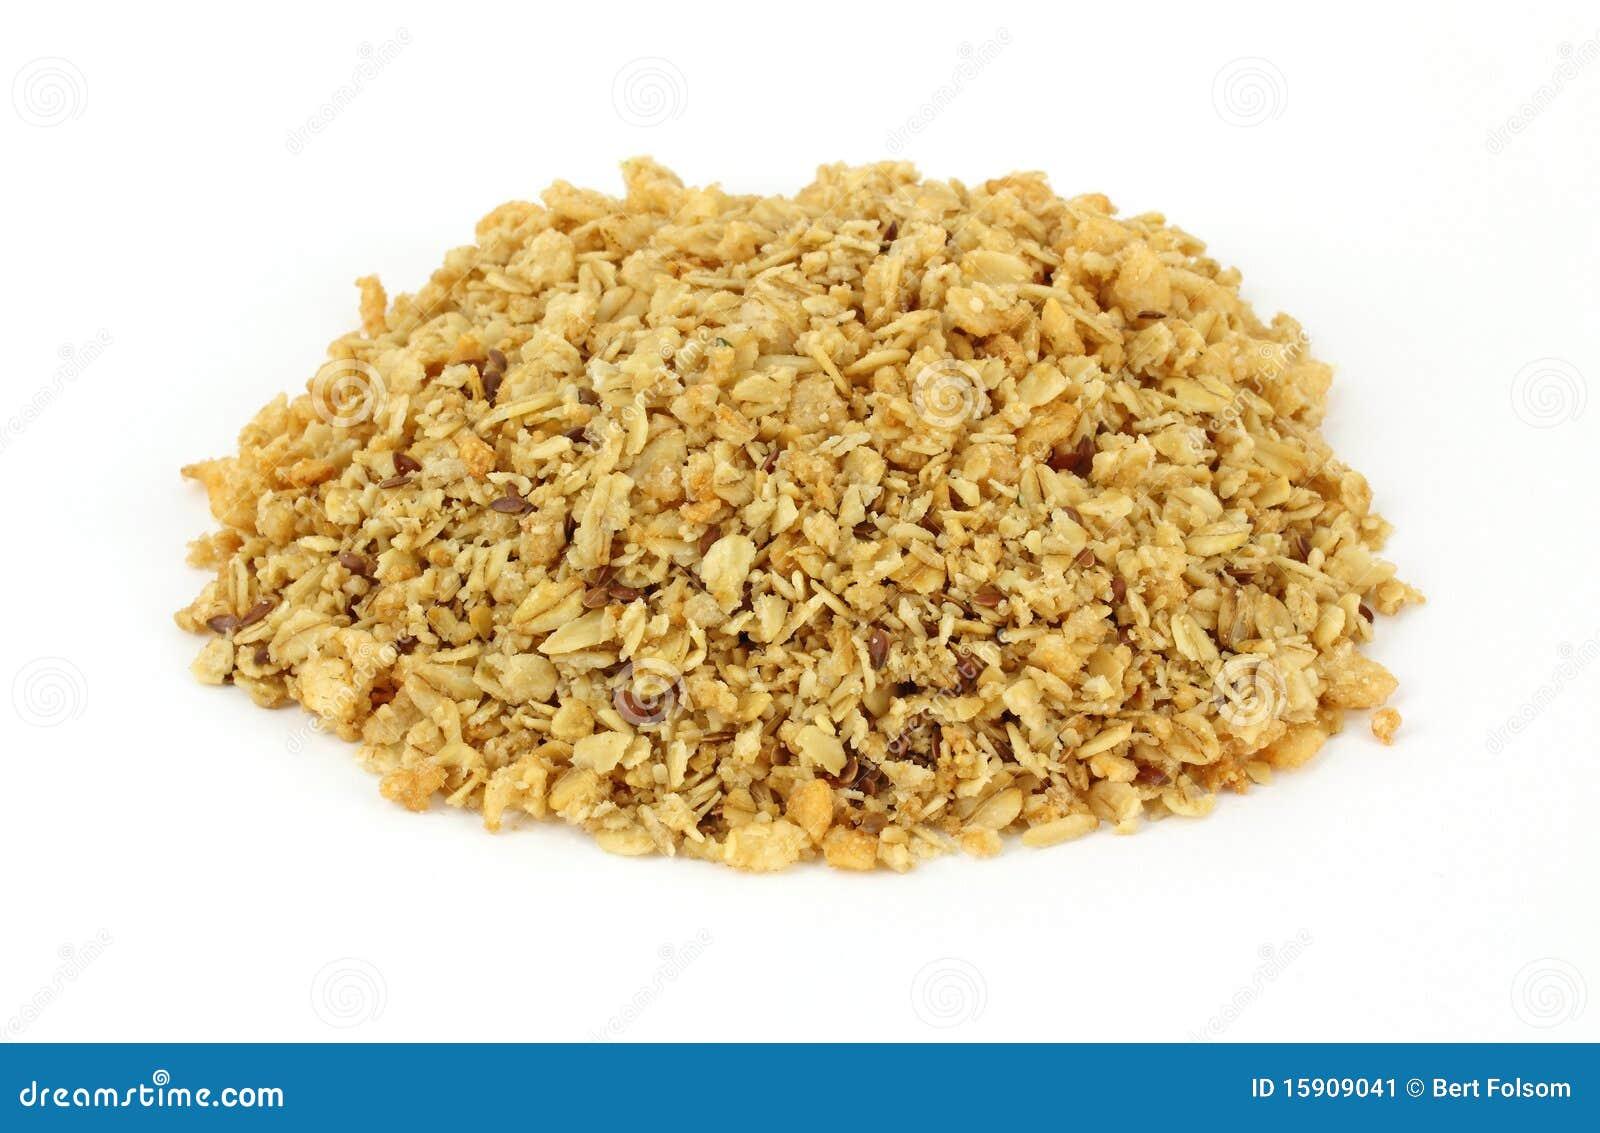 Golden Organic Flax Food